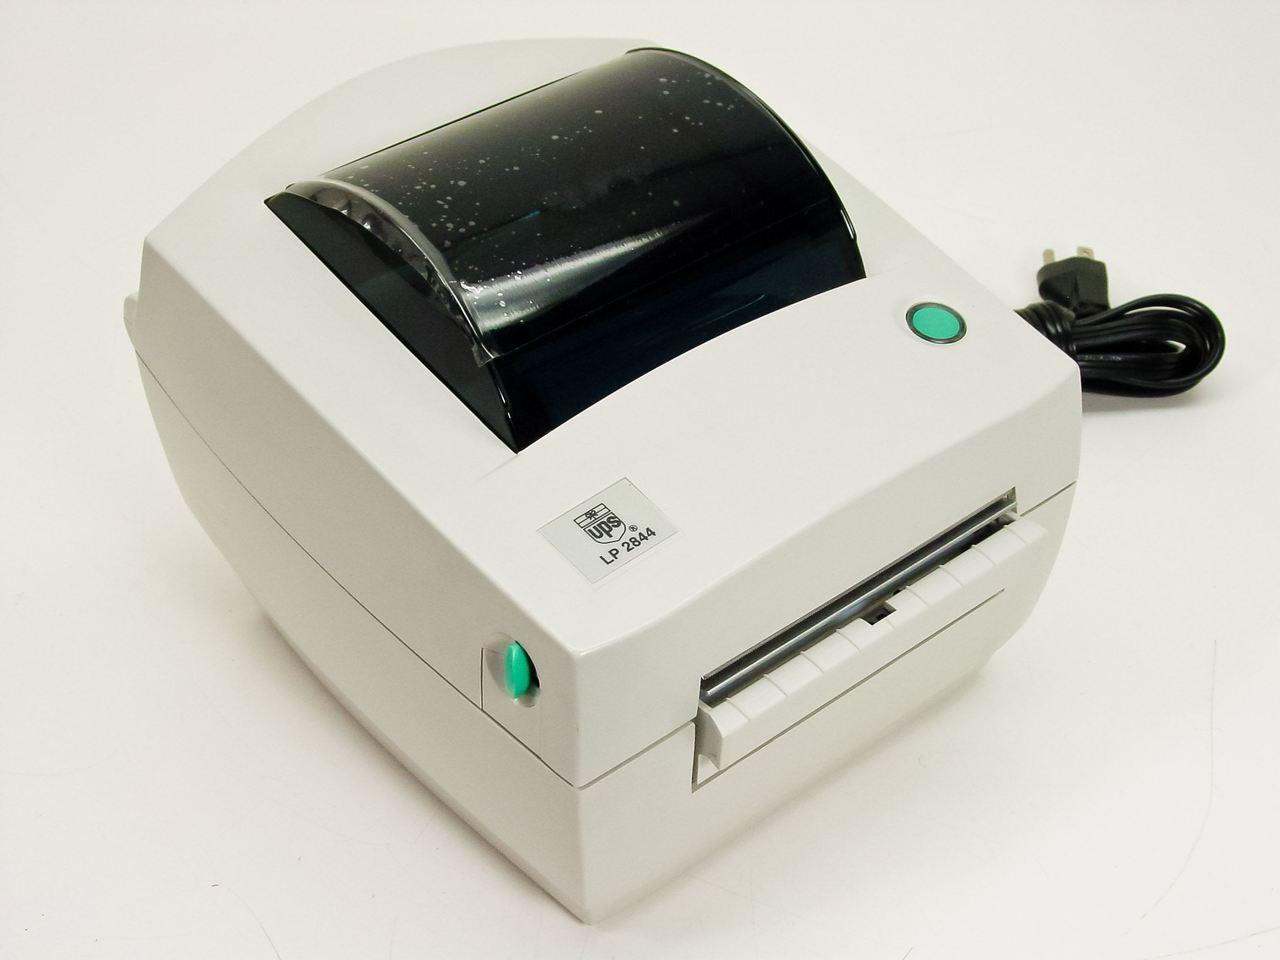 zebra lp2844 printer driver mac